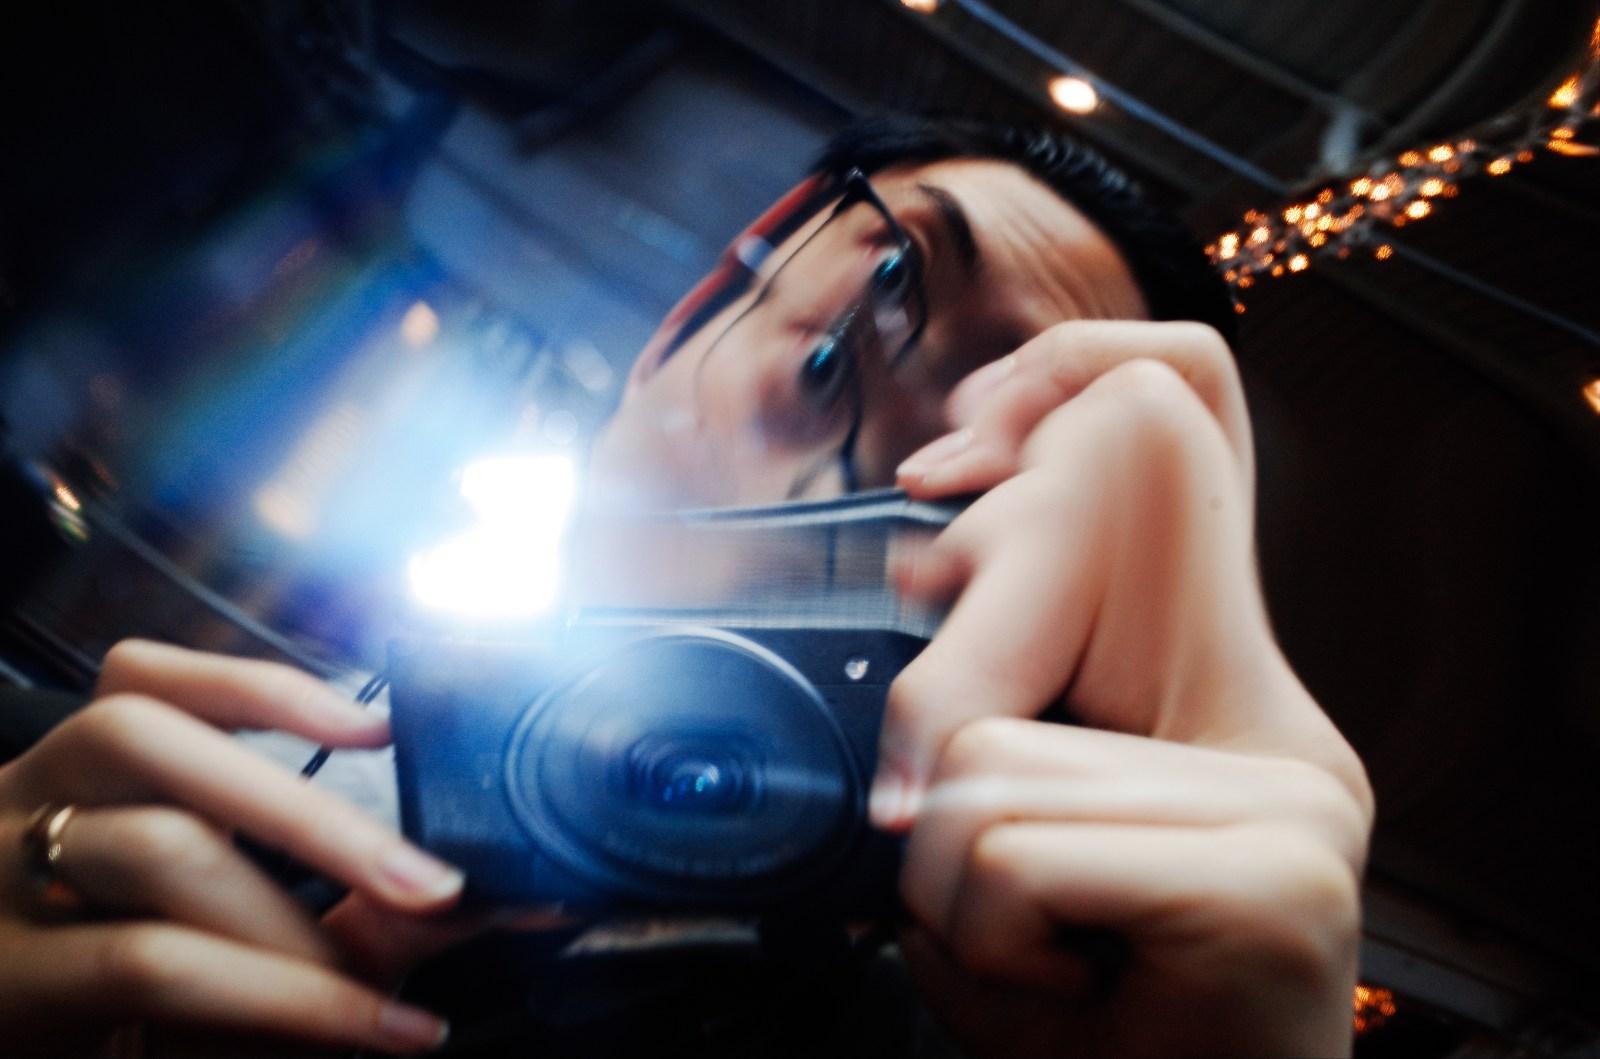 ERIC-KIM-PHOTOGRAPHY-AMSTERDAM-DIARY-201753